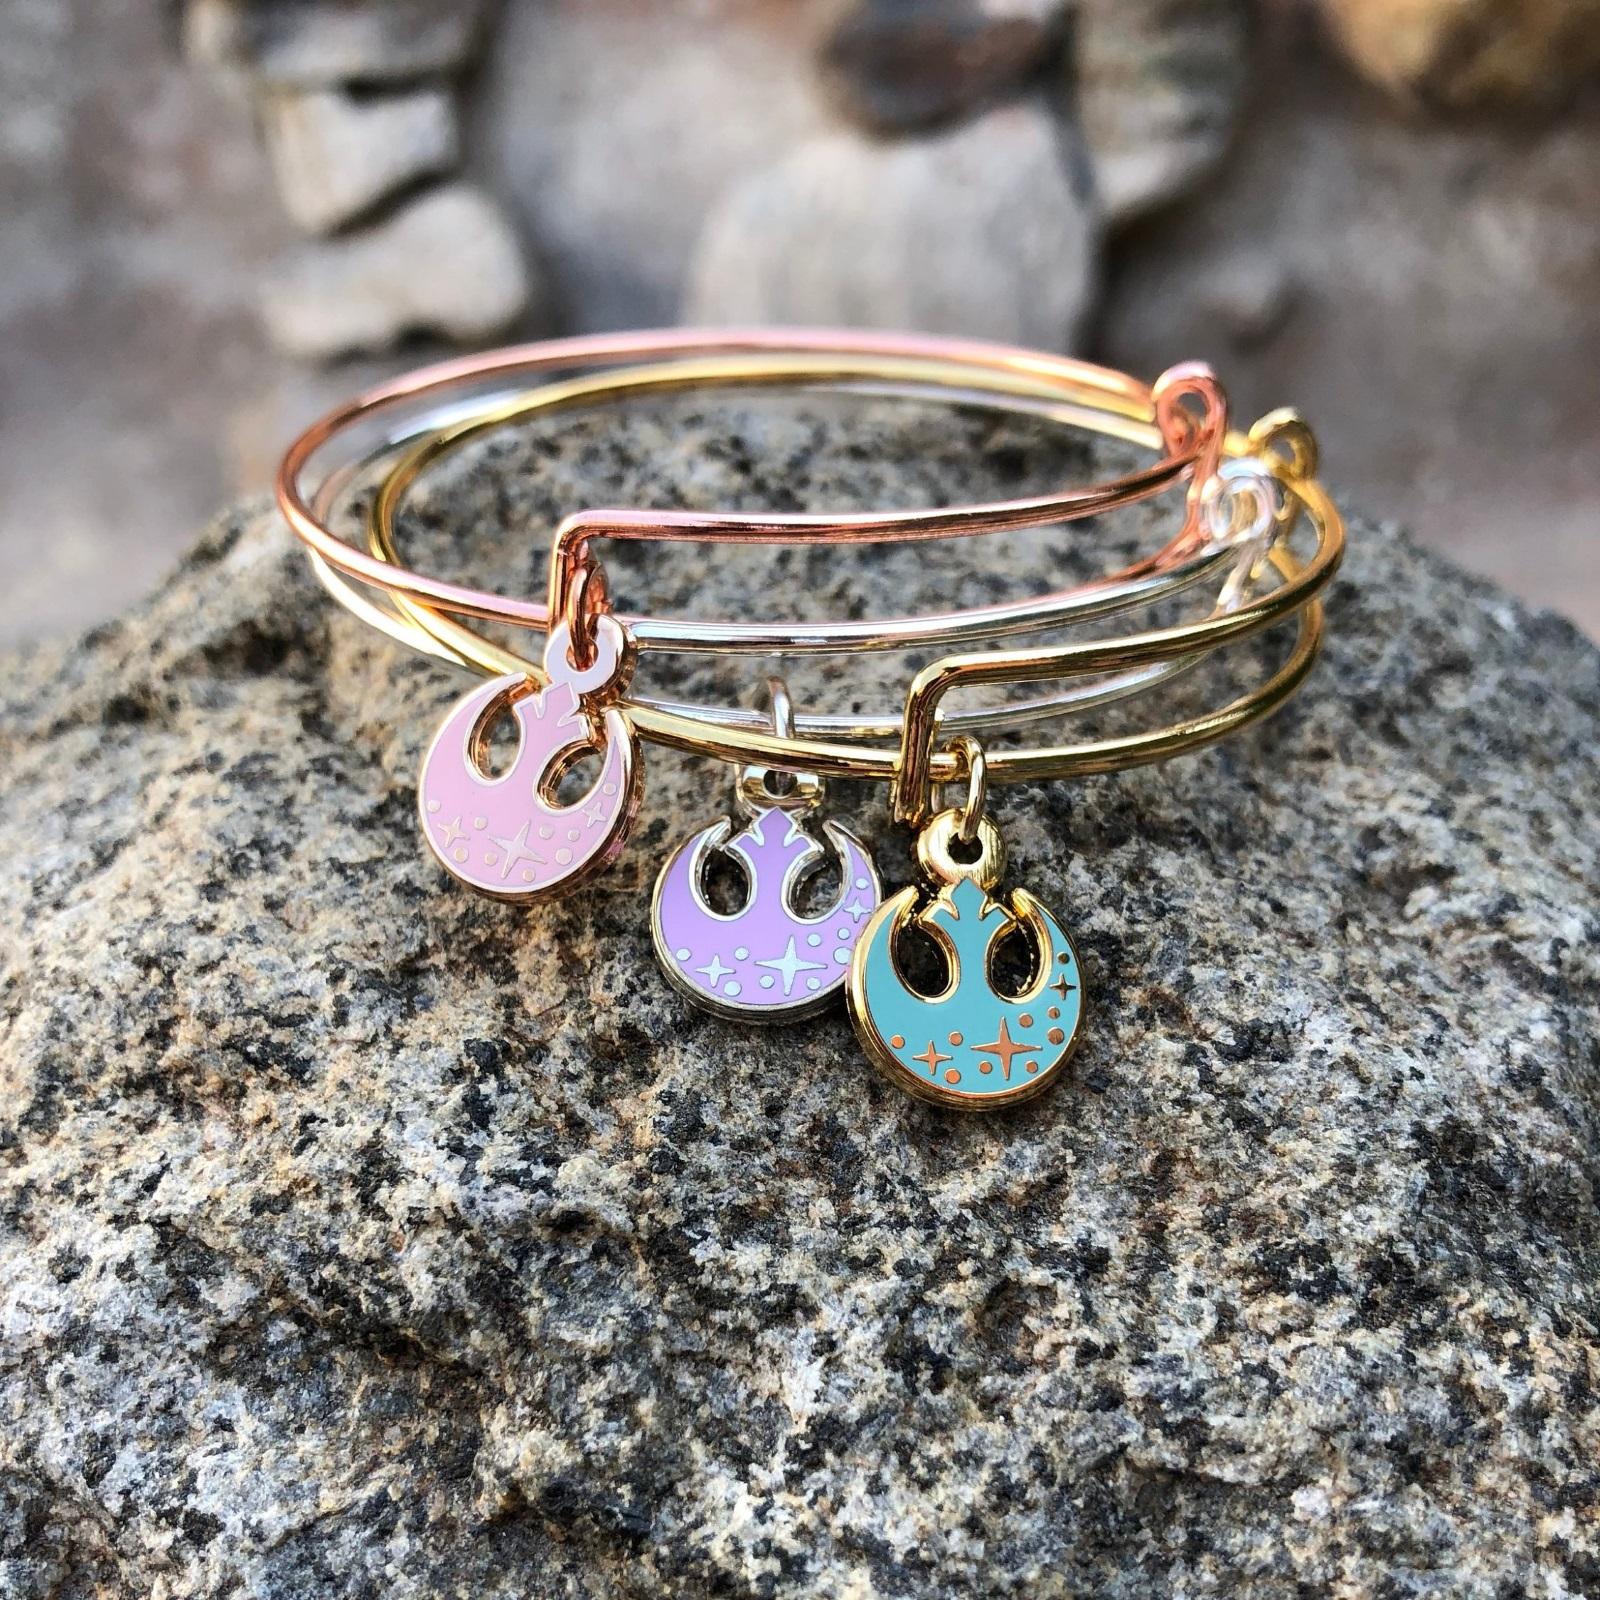 Star Wars Inspired Charm Bracelets by Utinni Bikini on Etsy